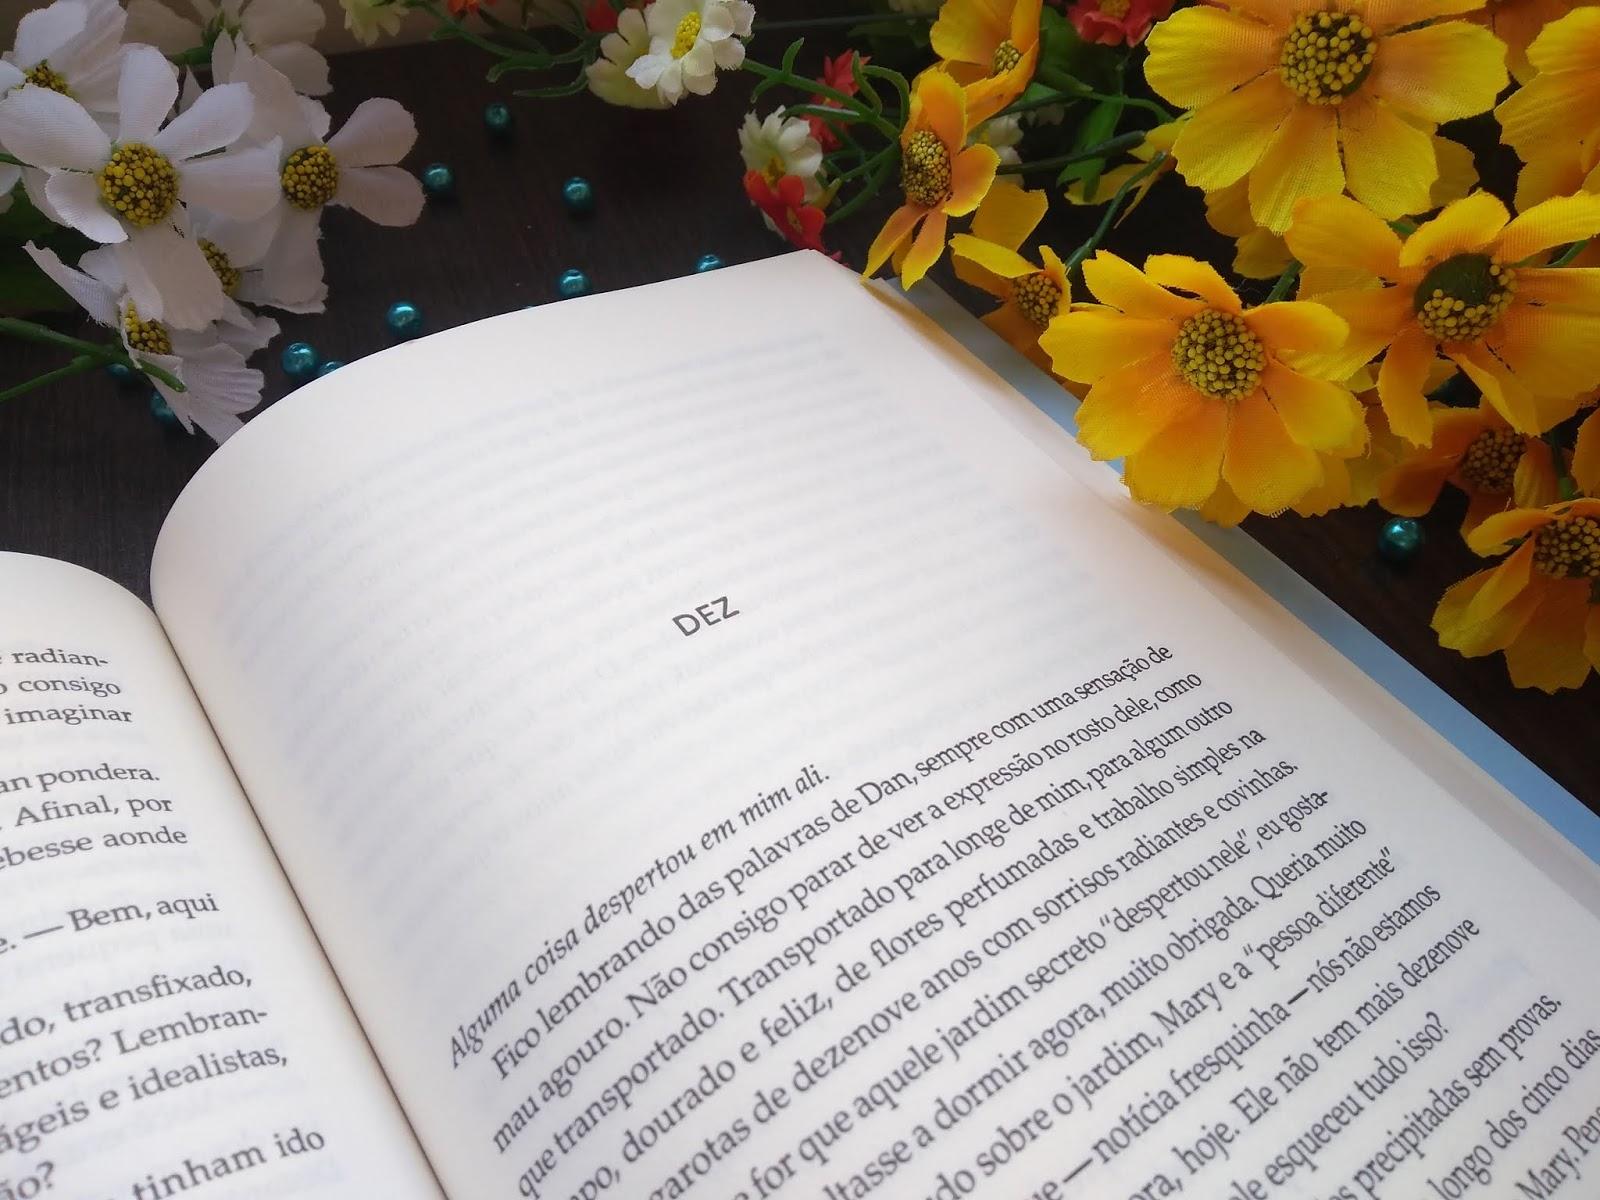 DICA DE LIVRO: MAS TEM QUE SER MESMO PARA SEMPRE? - SOPHIE KINSELLA